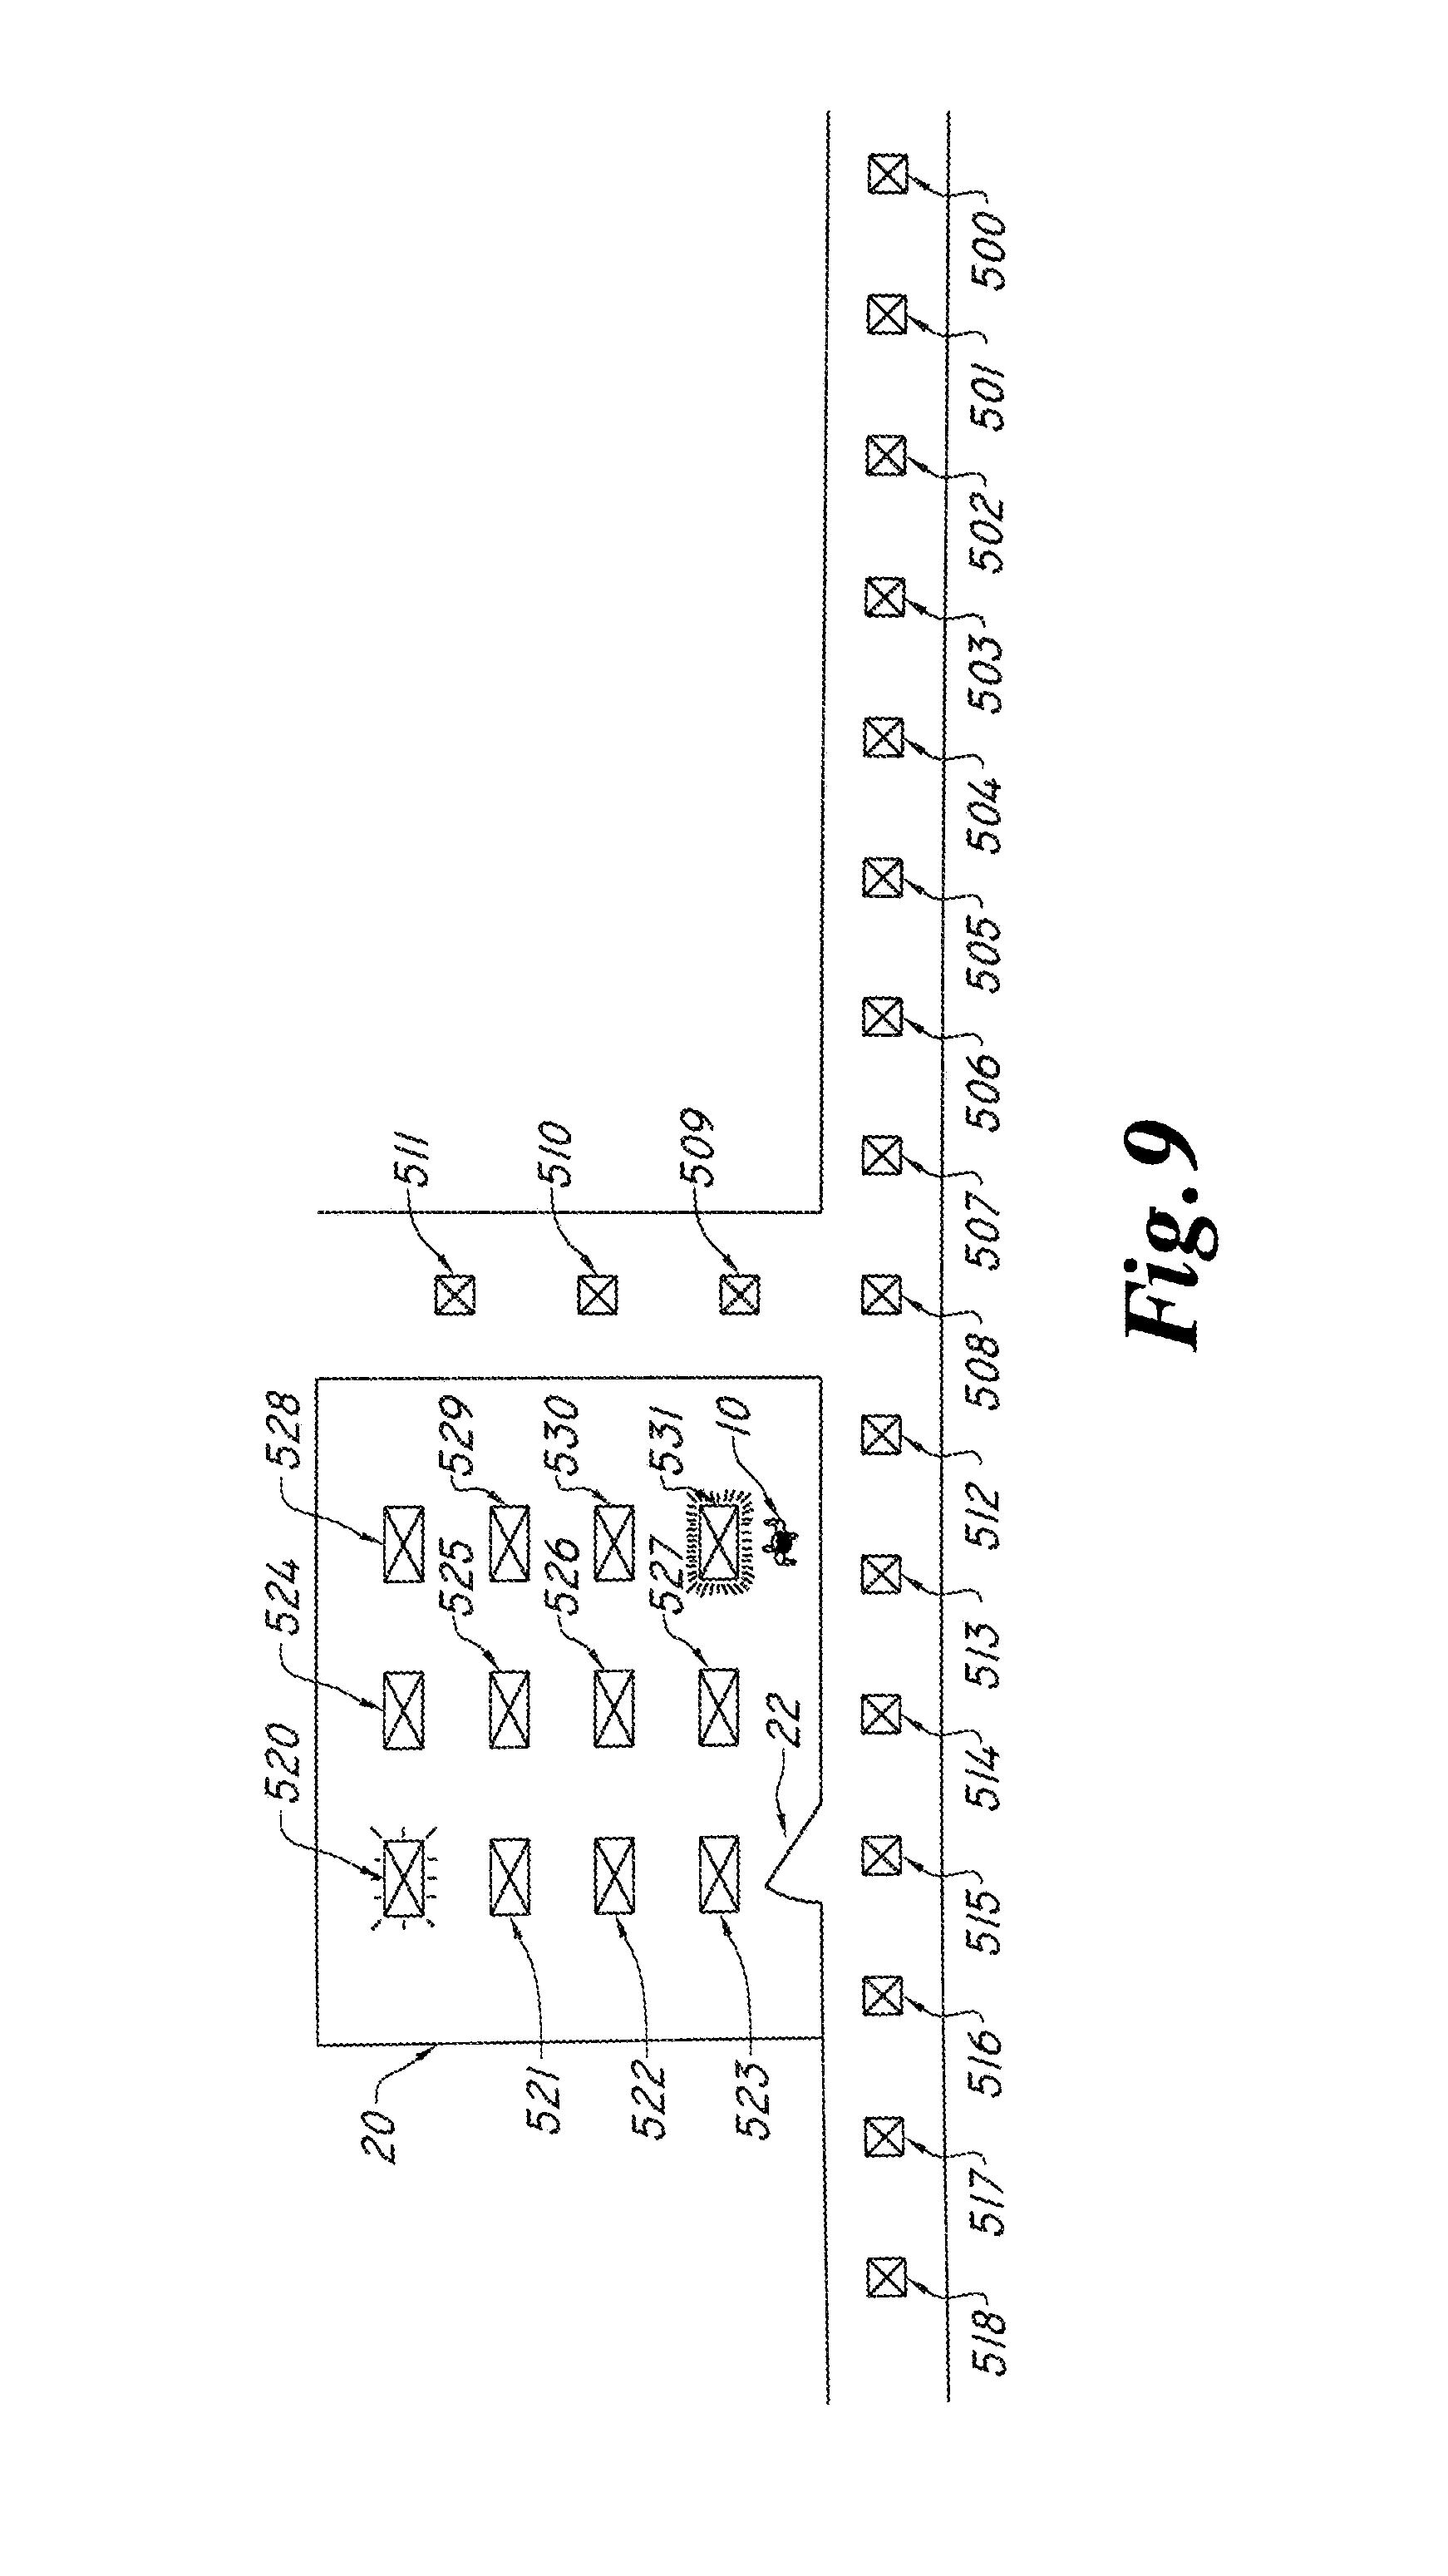 Patent US 9,265,112 B2